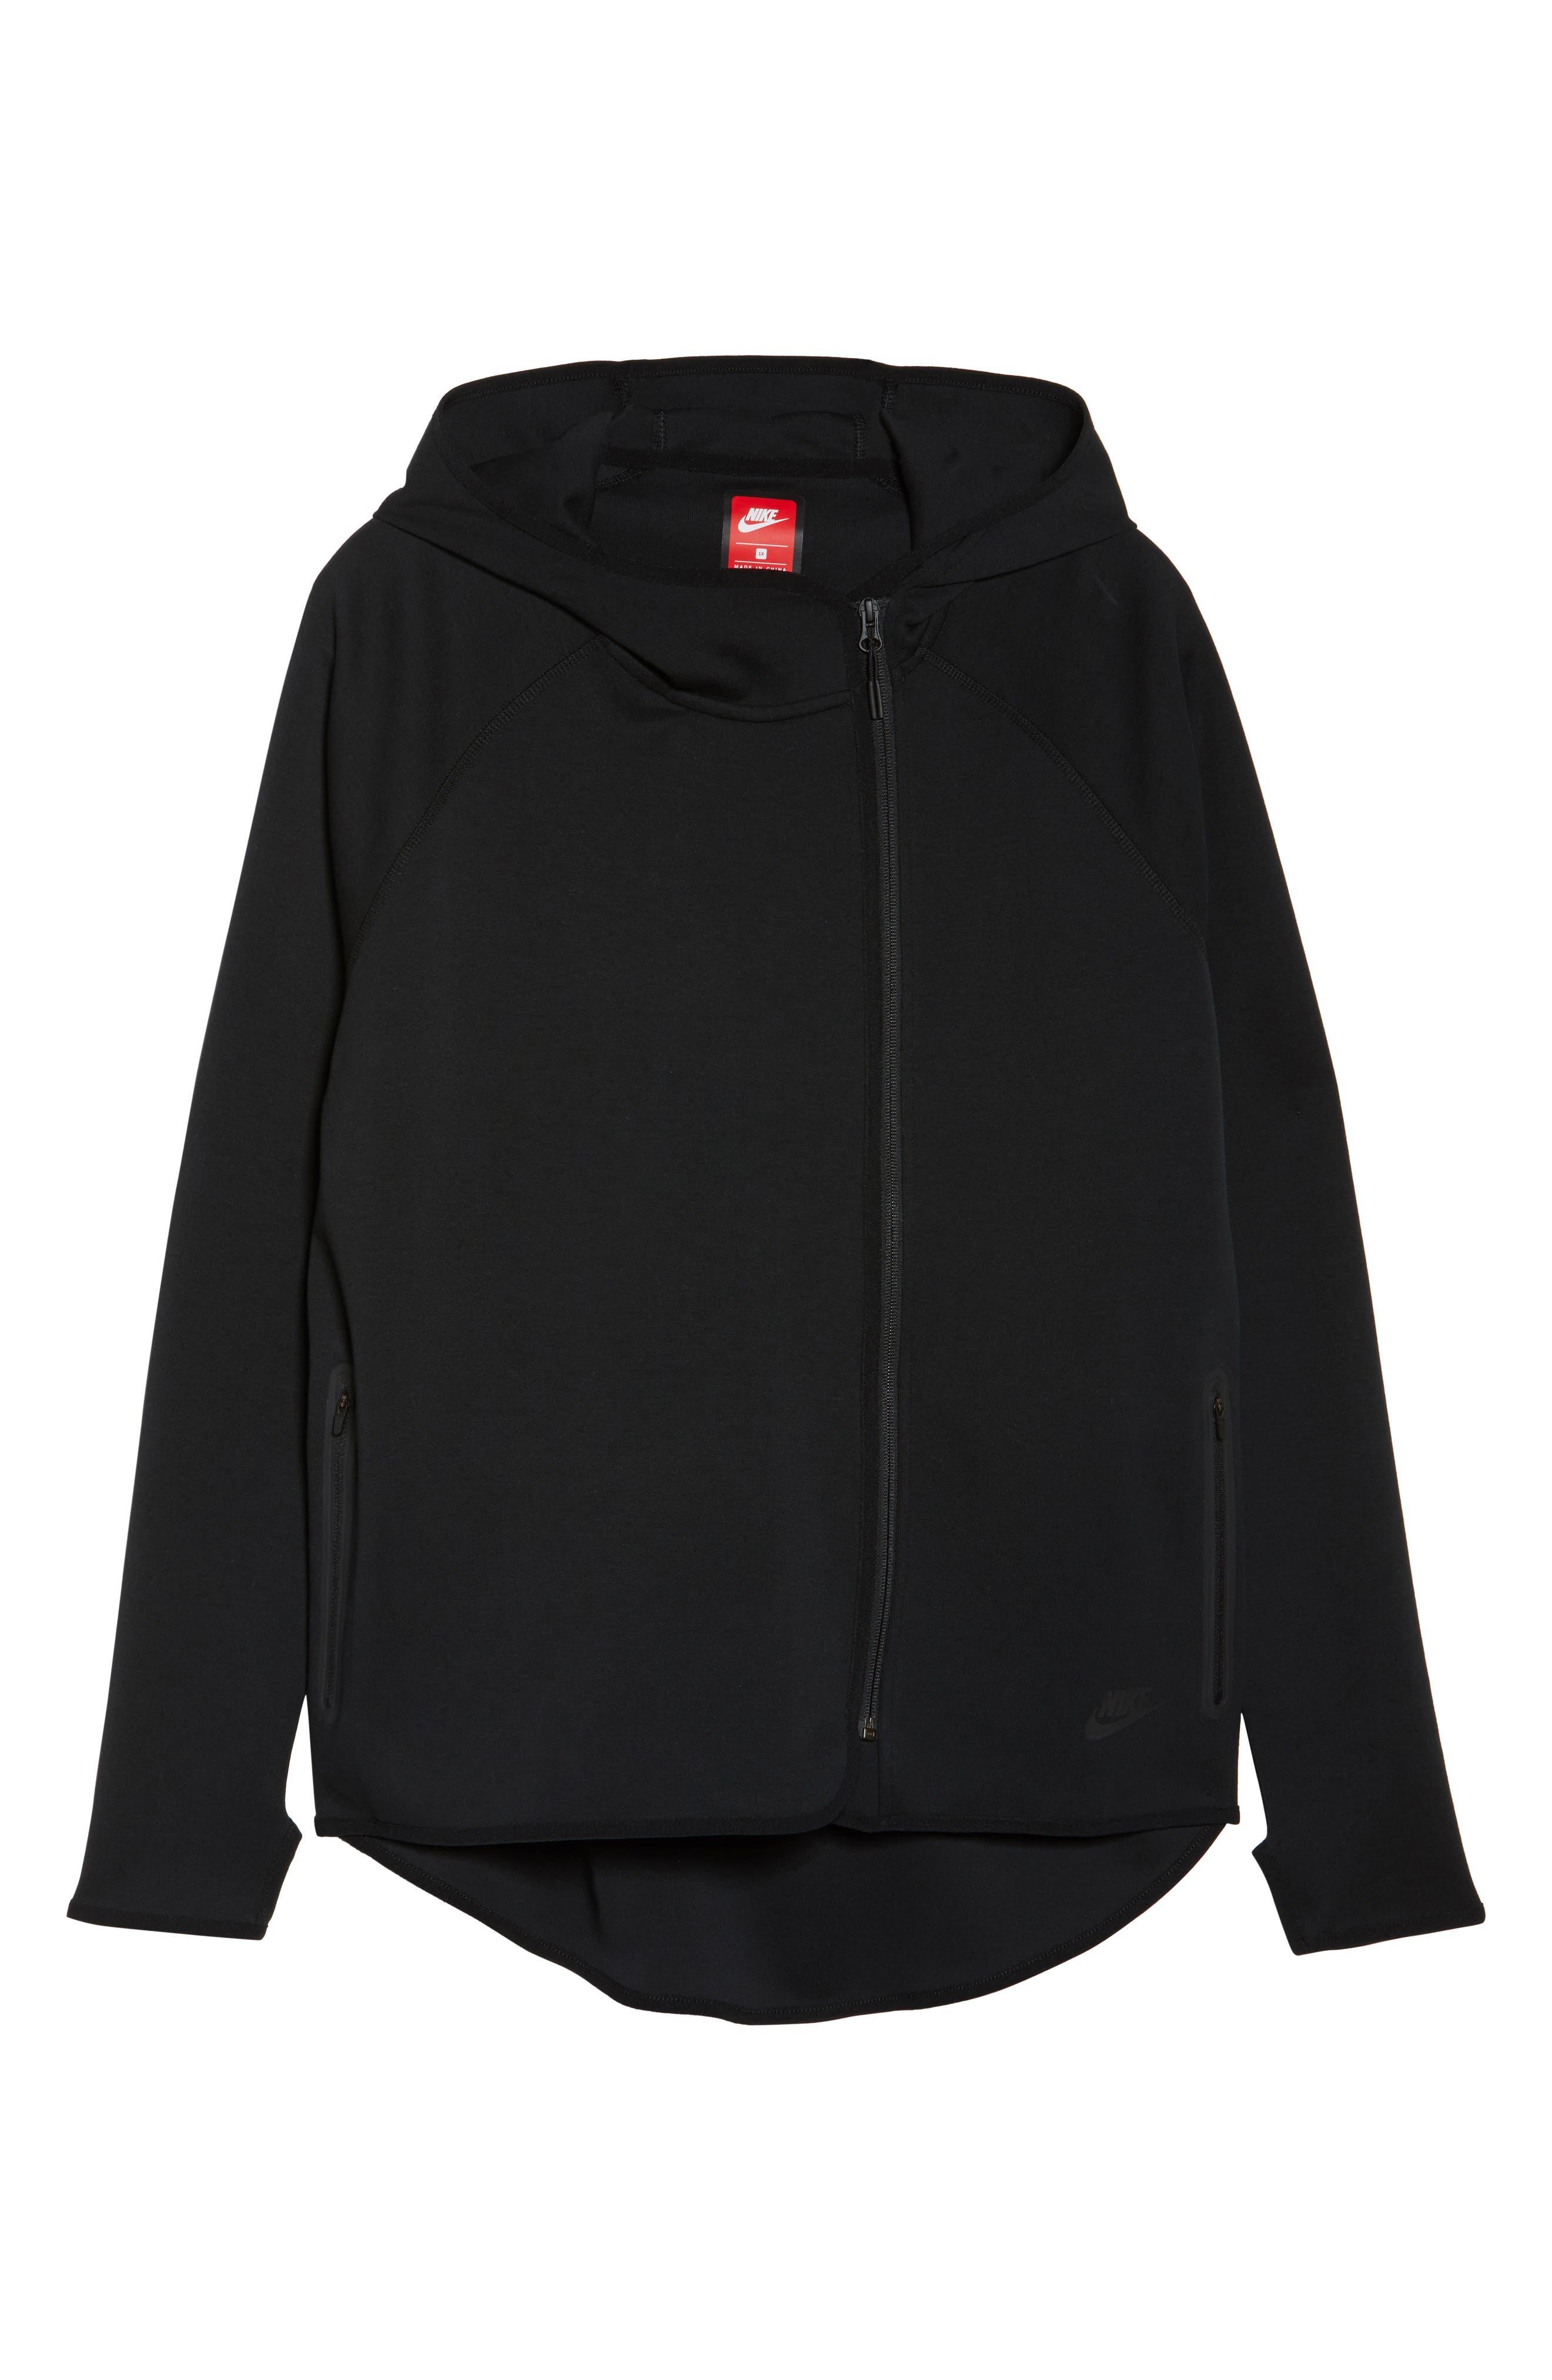 Sportswear Tech Fleece Zip Cape,                             Alternate thumbnail 6, color,                             Black/ Black